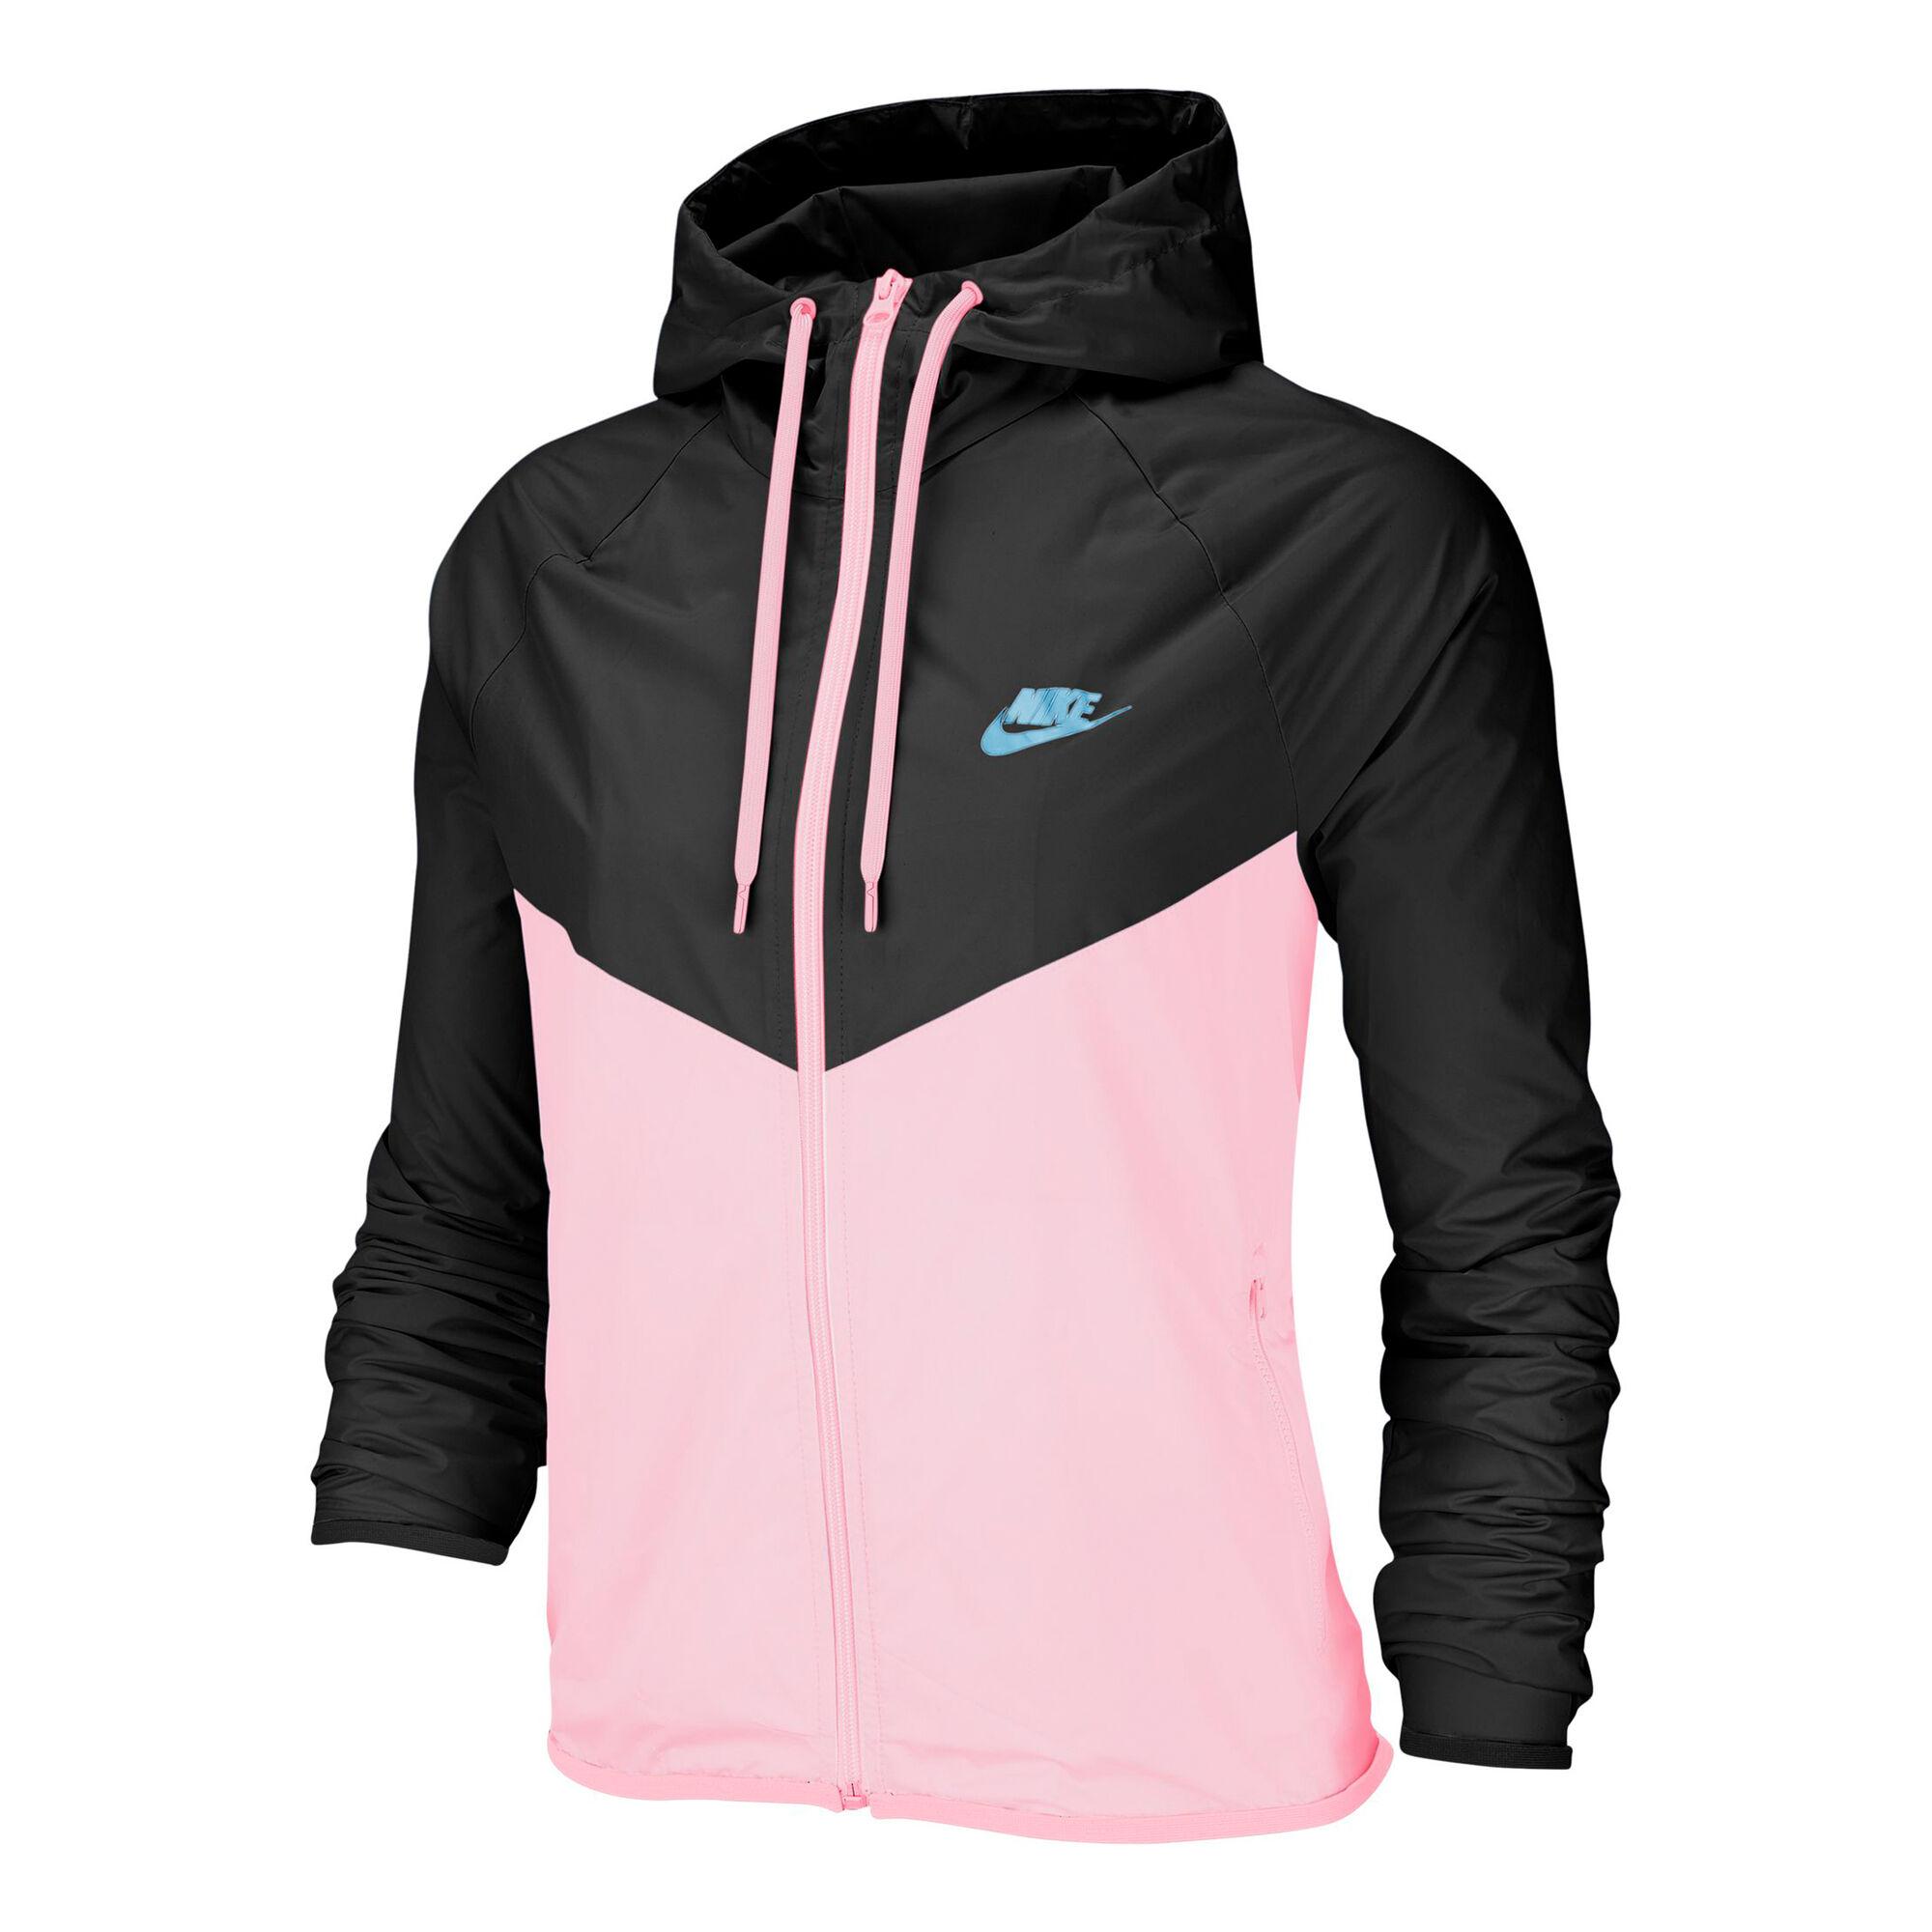 Trainingsjacke Damen Nike